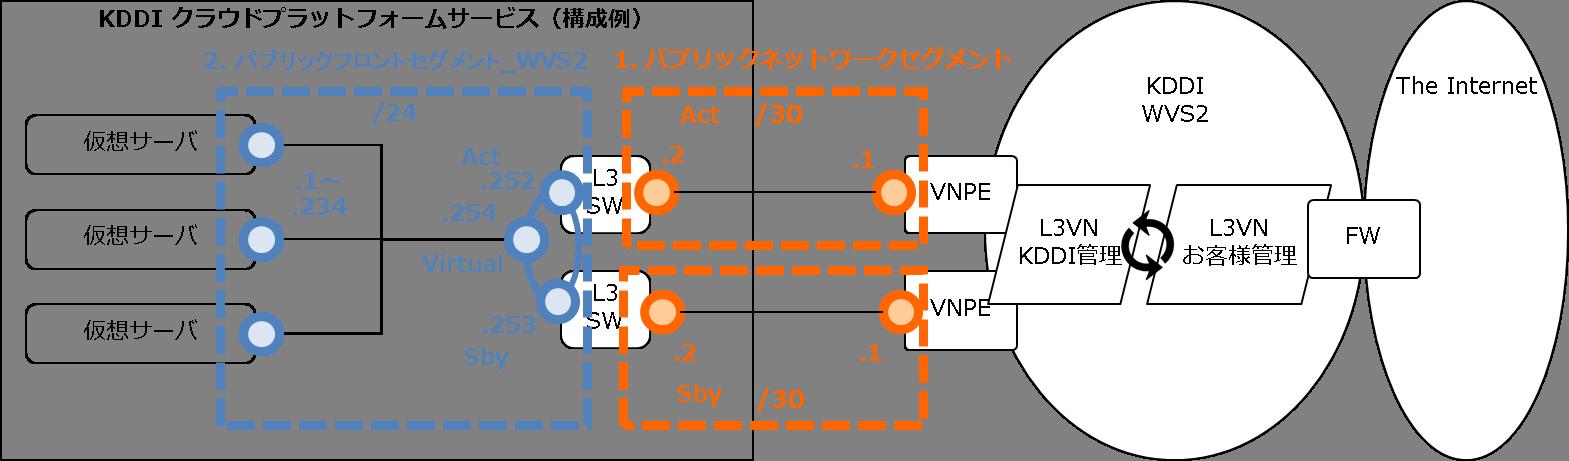 WVS2internet